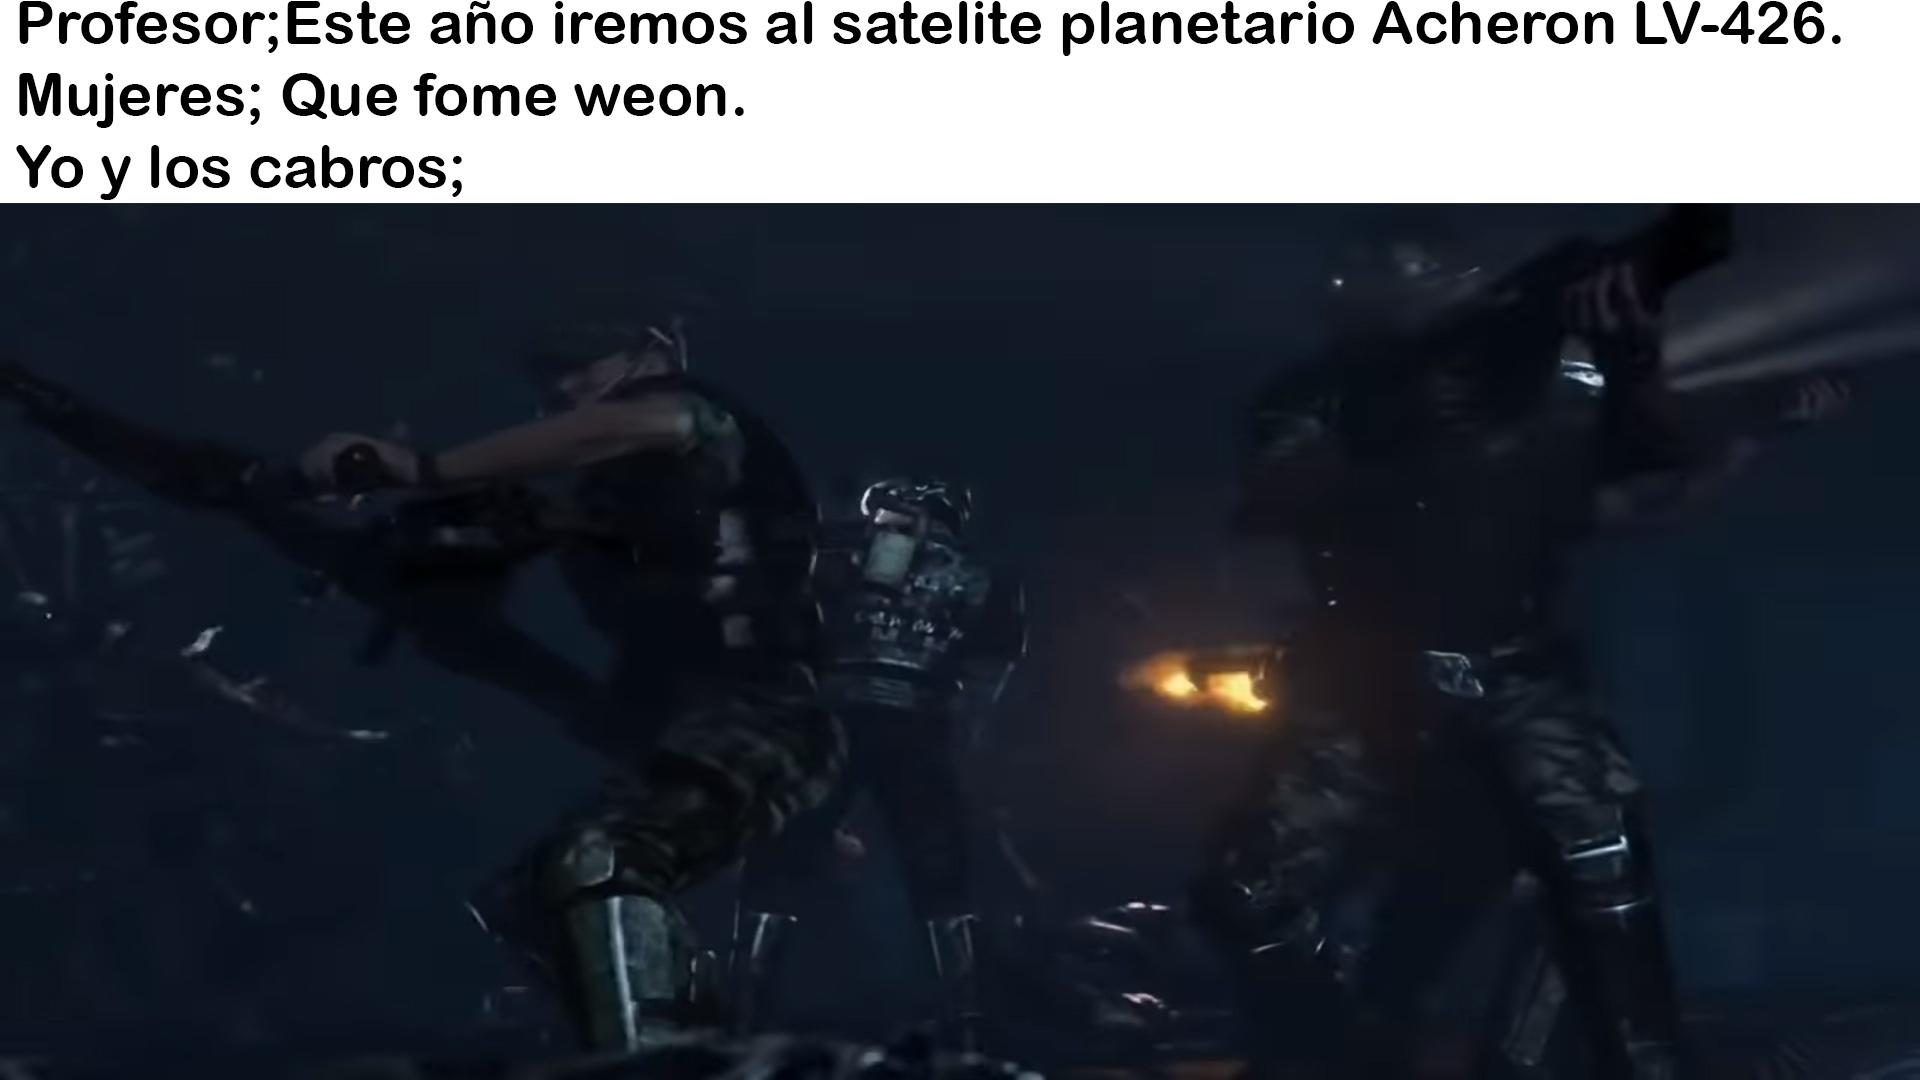 LV-426 - meme